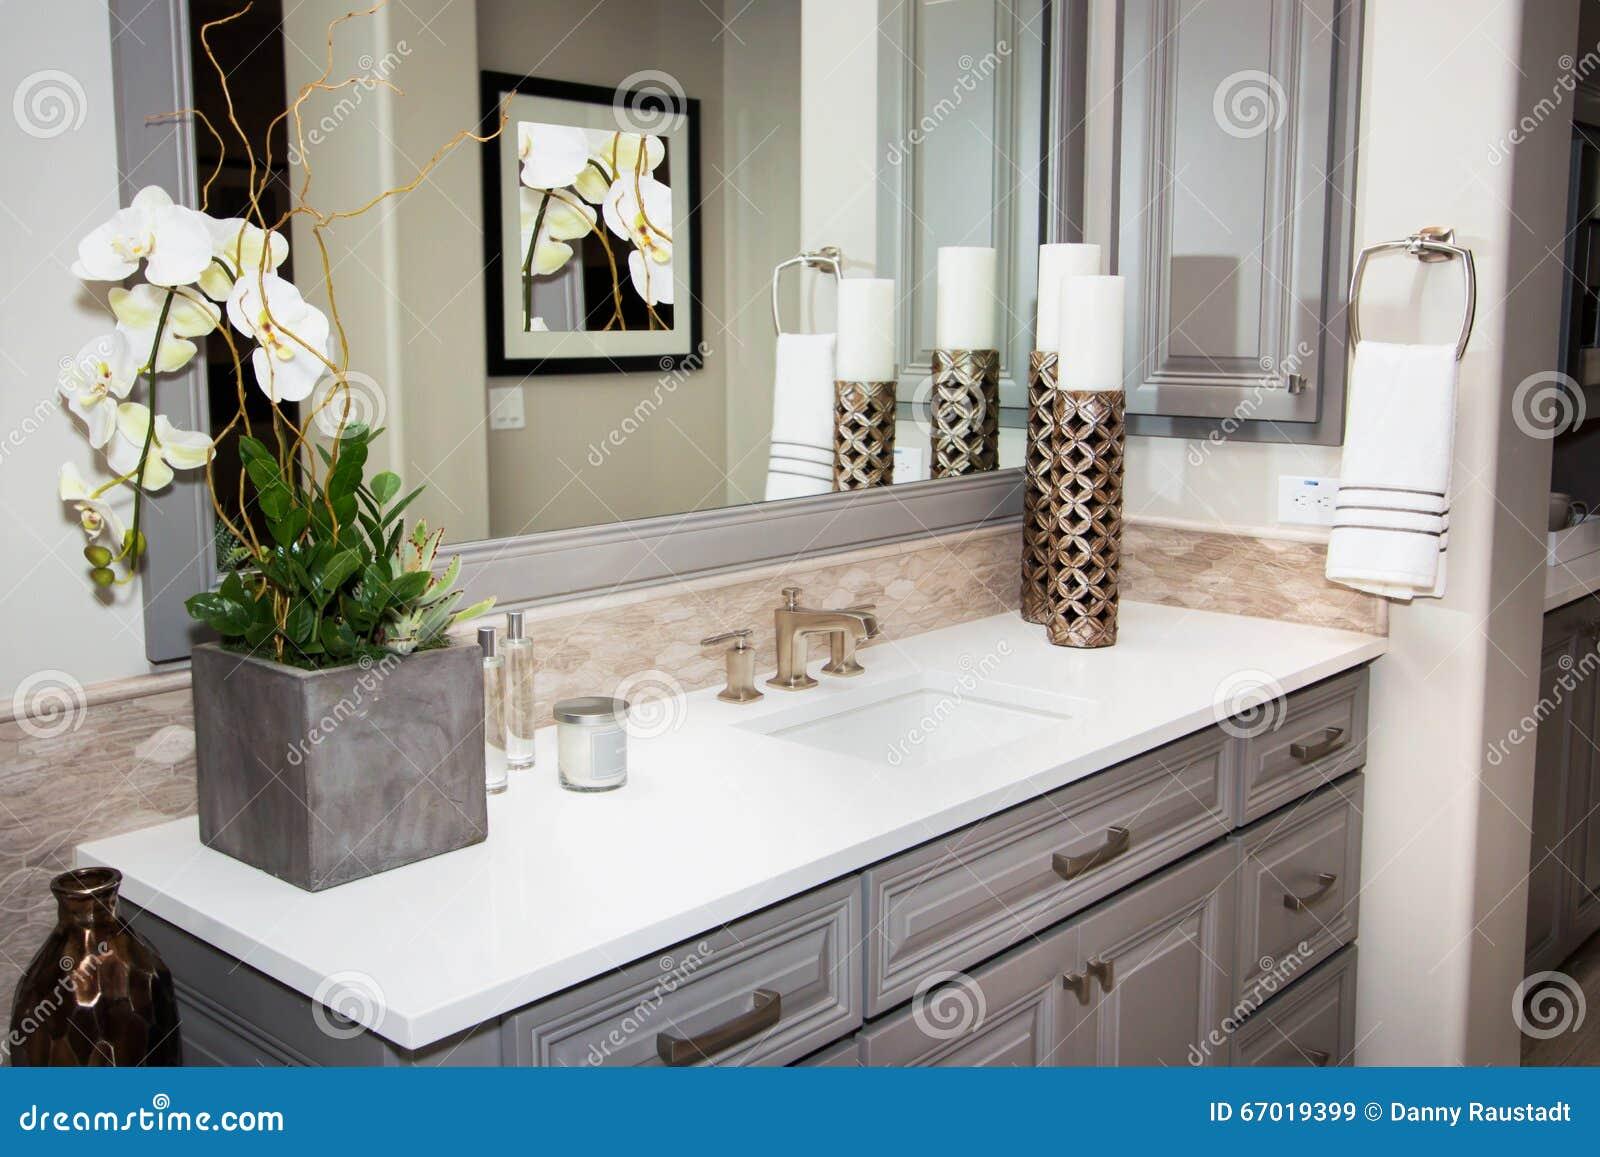 Home interior bathroom mirror and sink